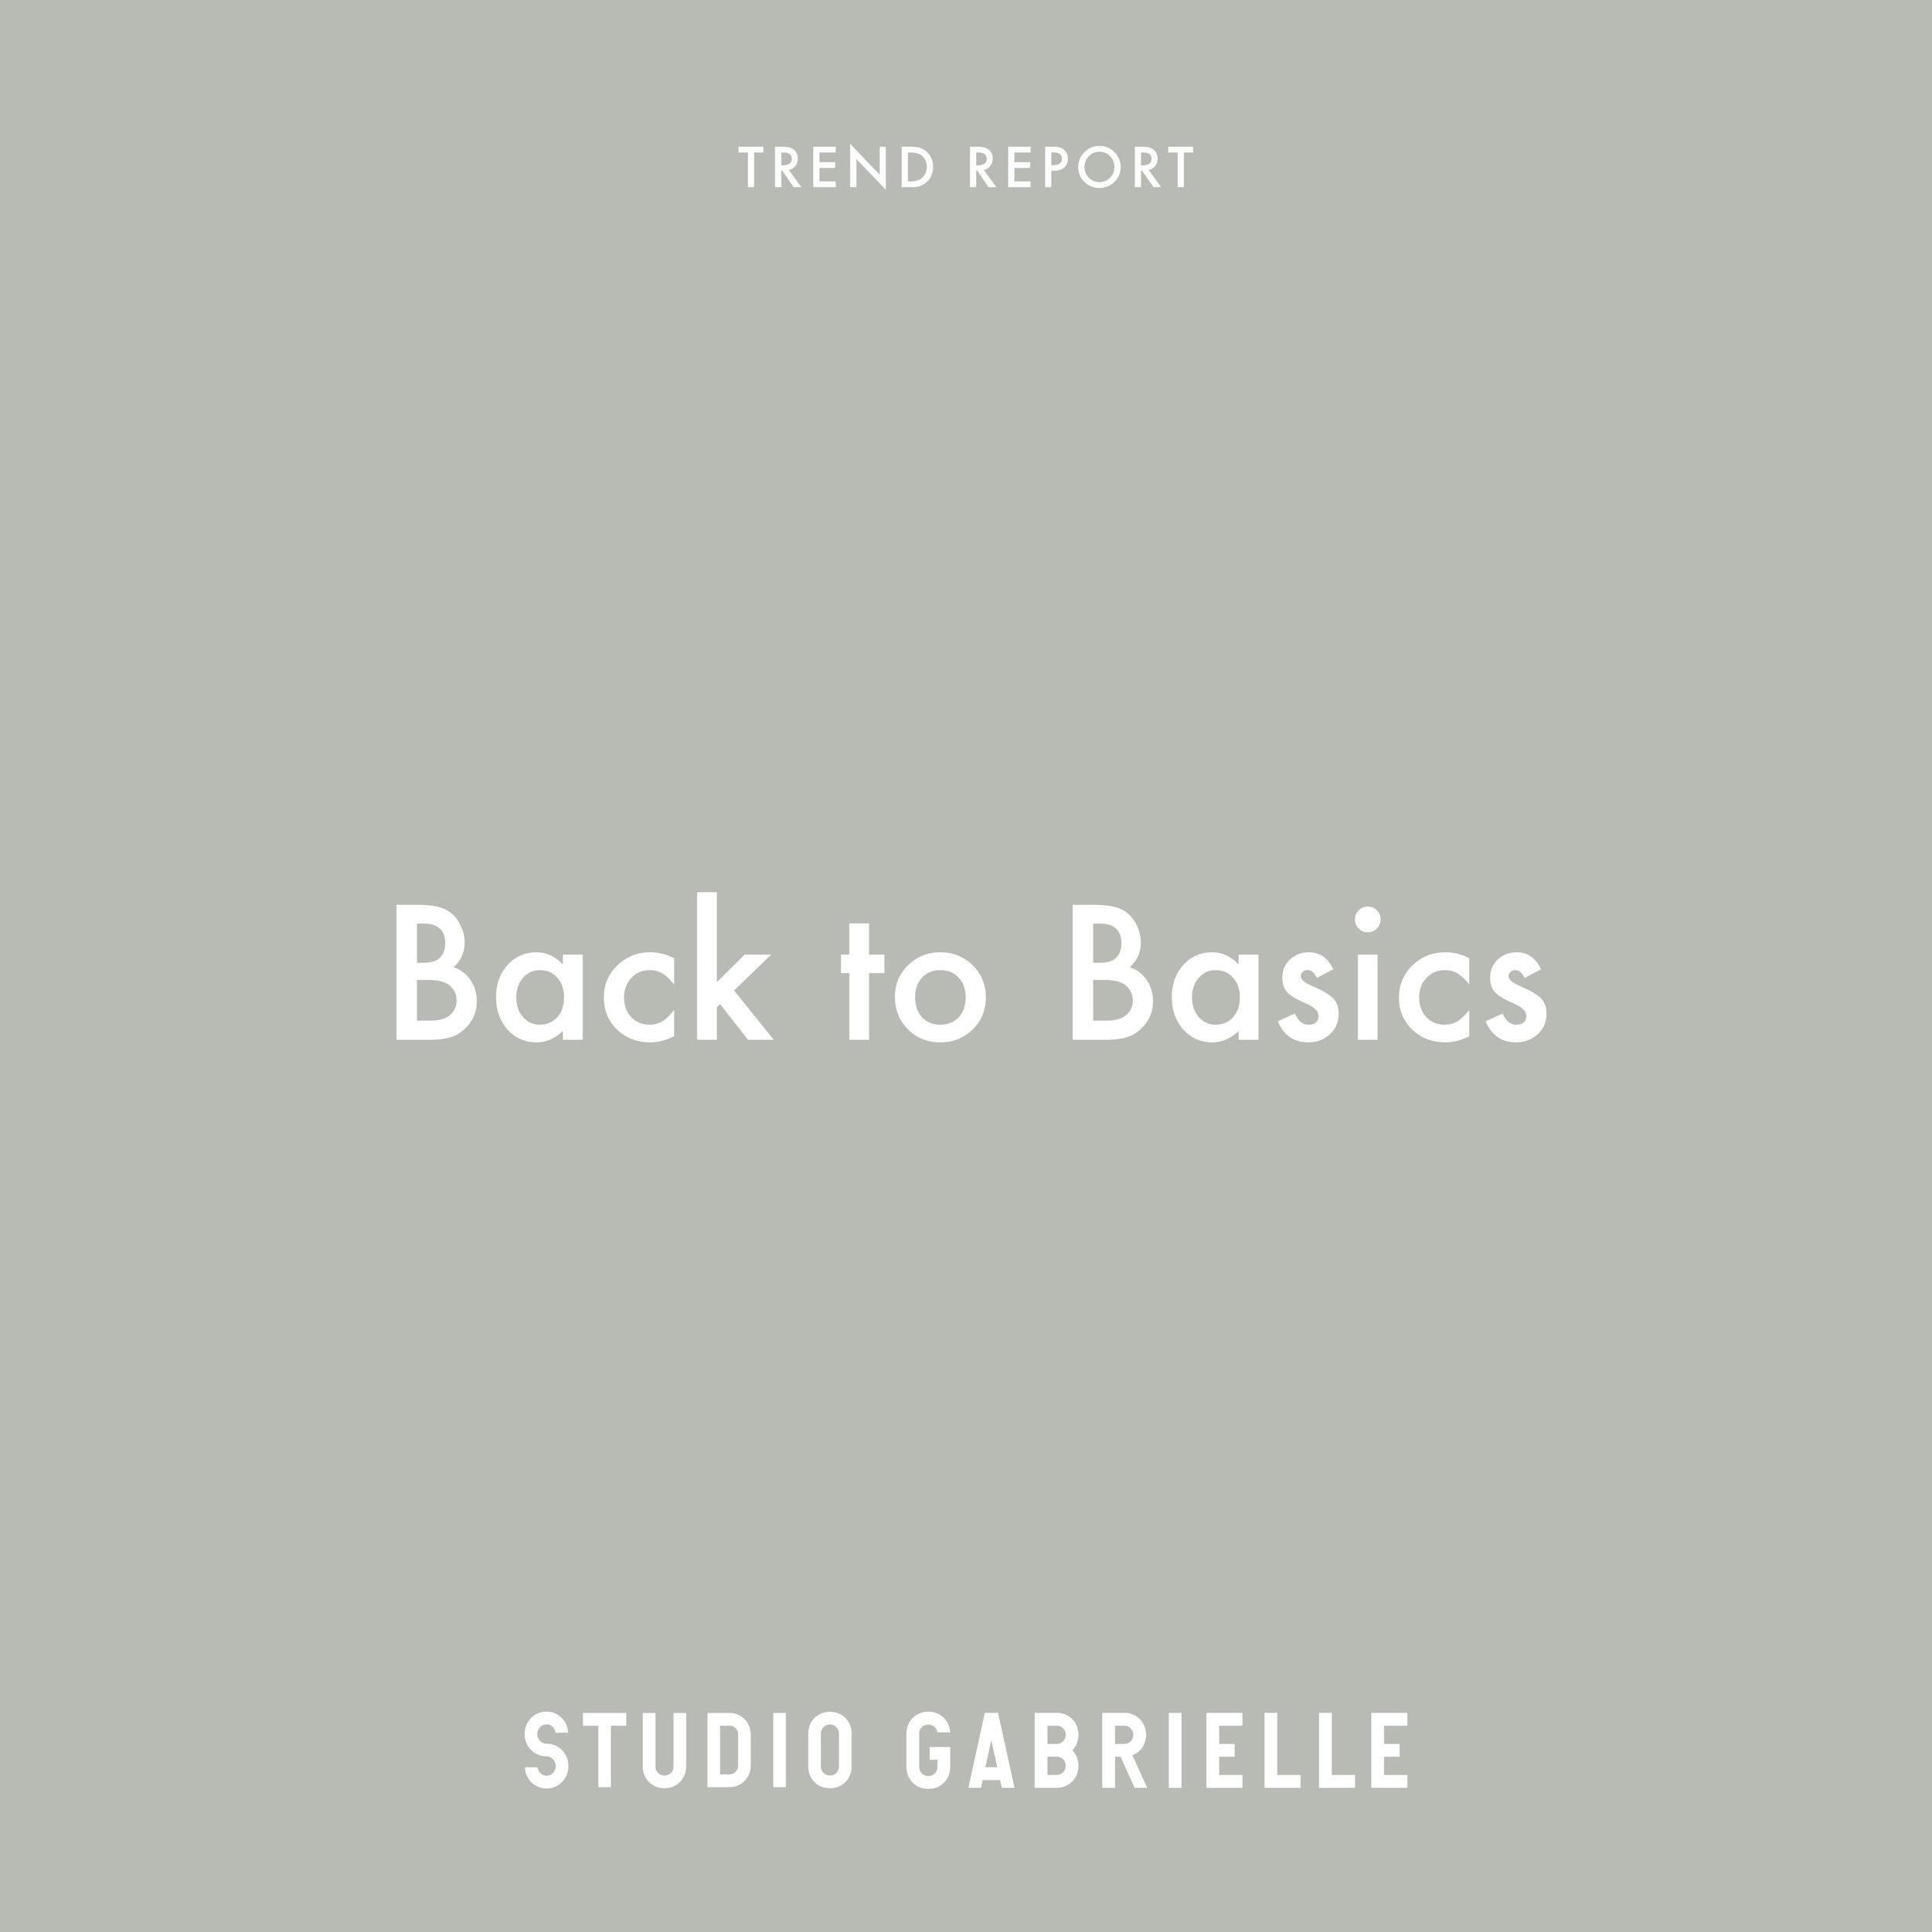 StudioGabrielle_TrendReport_BackToBasics